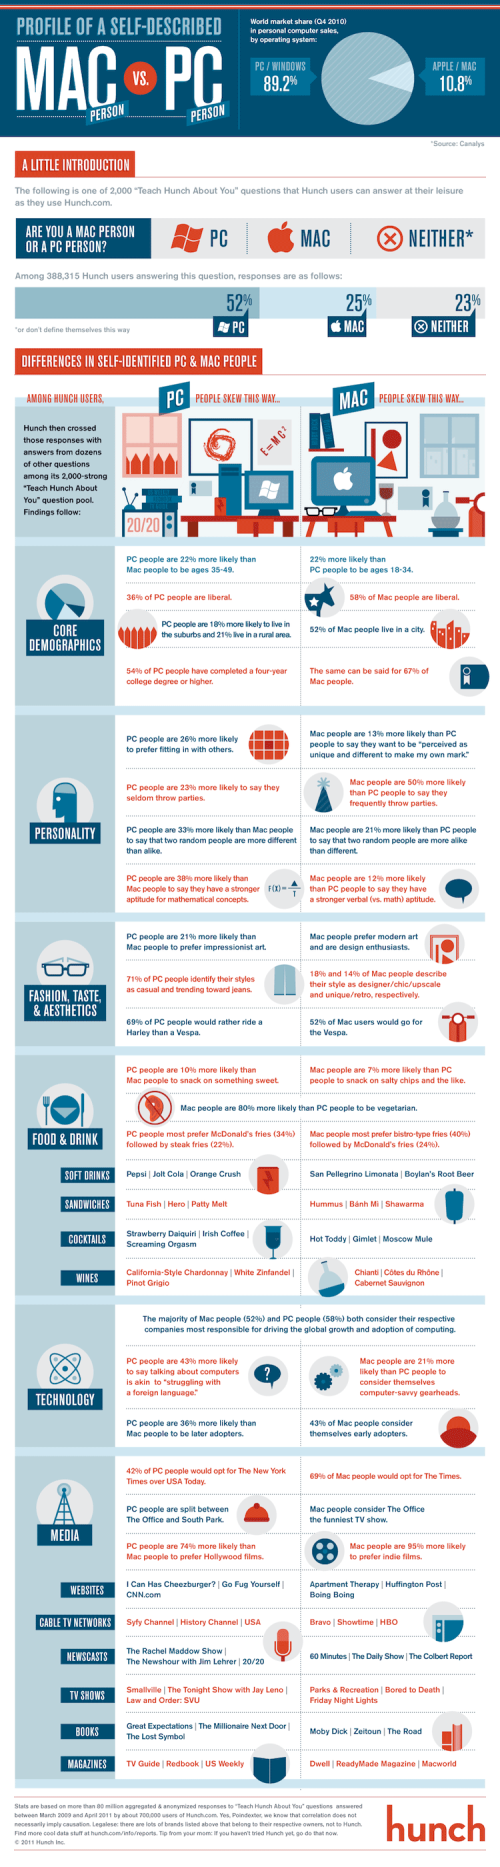 Self-Described Mac vs. PC People infographic